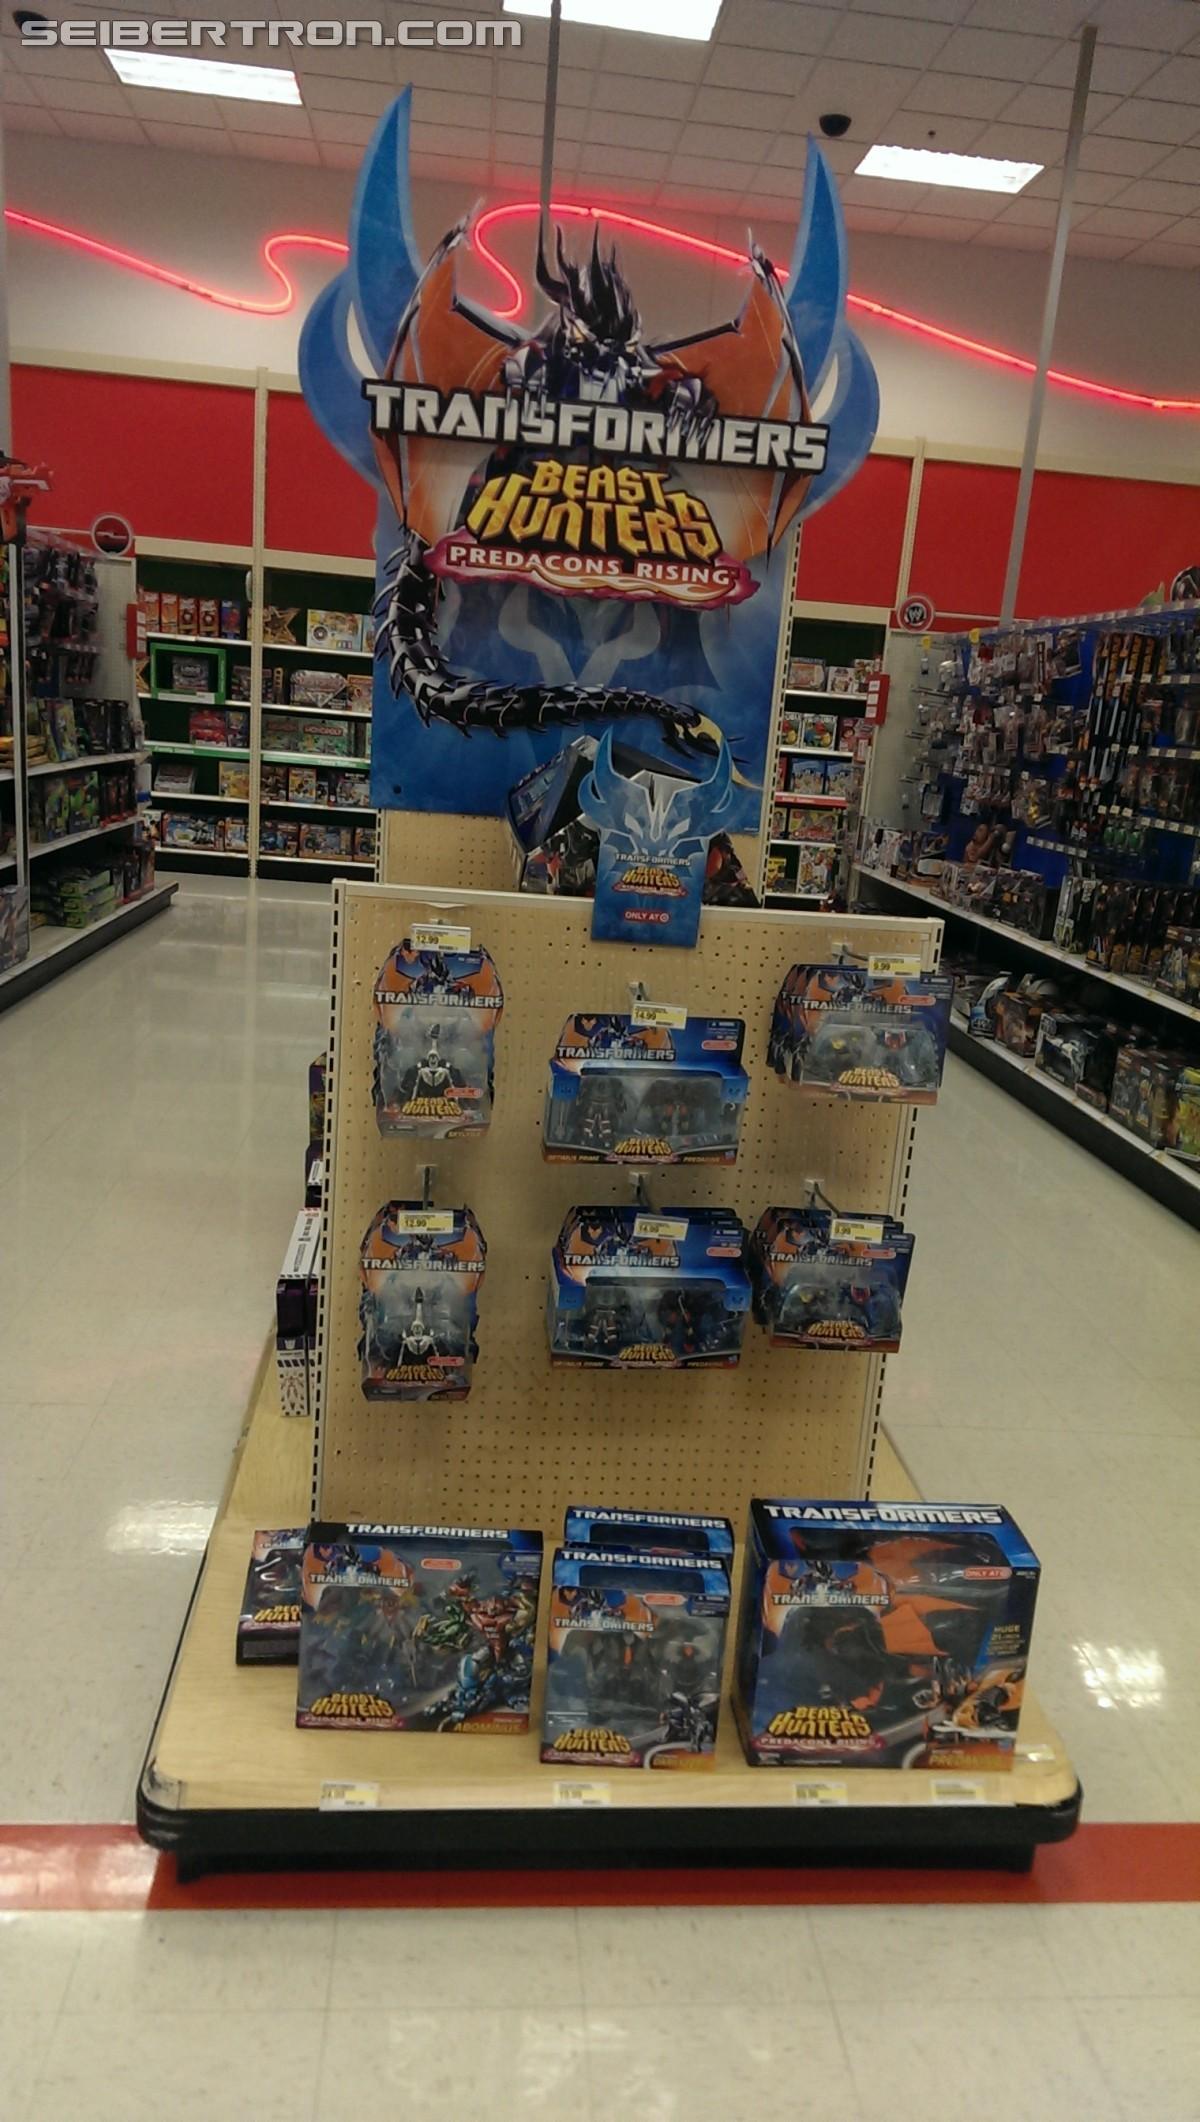 "Transformers News: ""Predacons Rising"" End Cap Display"